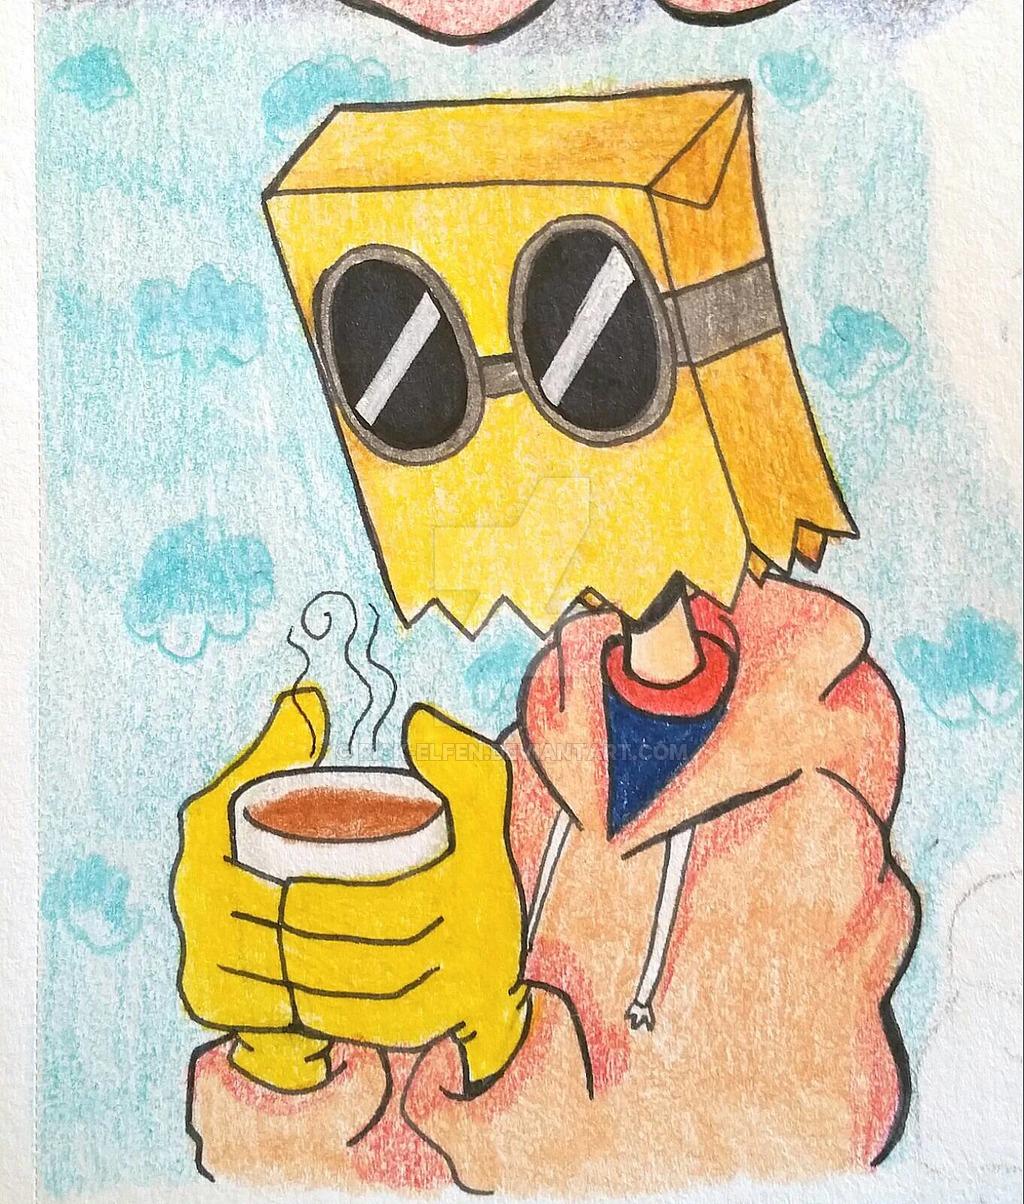 Elfen clipart yellow Elfen Flug  Relax on